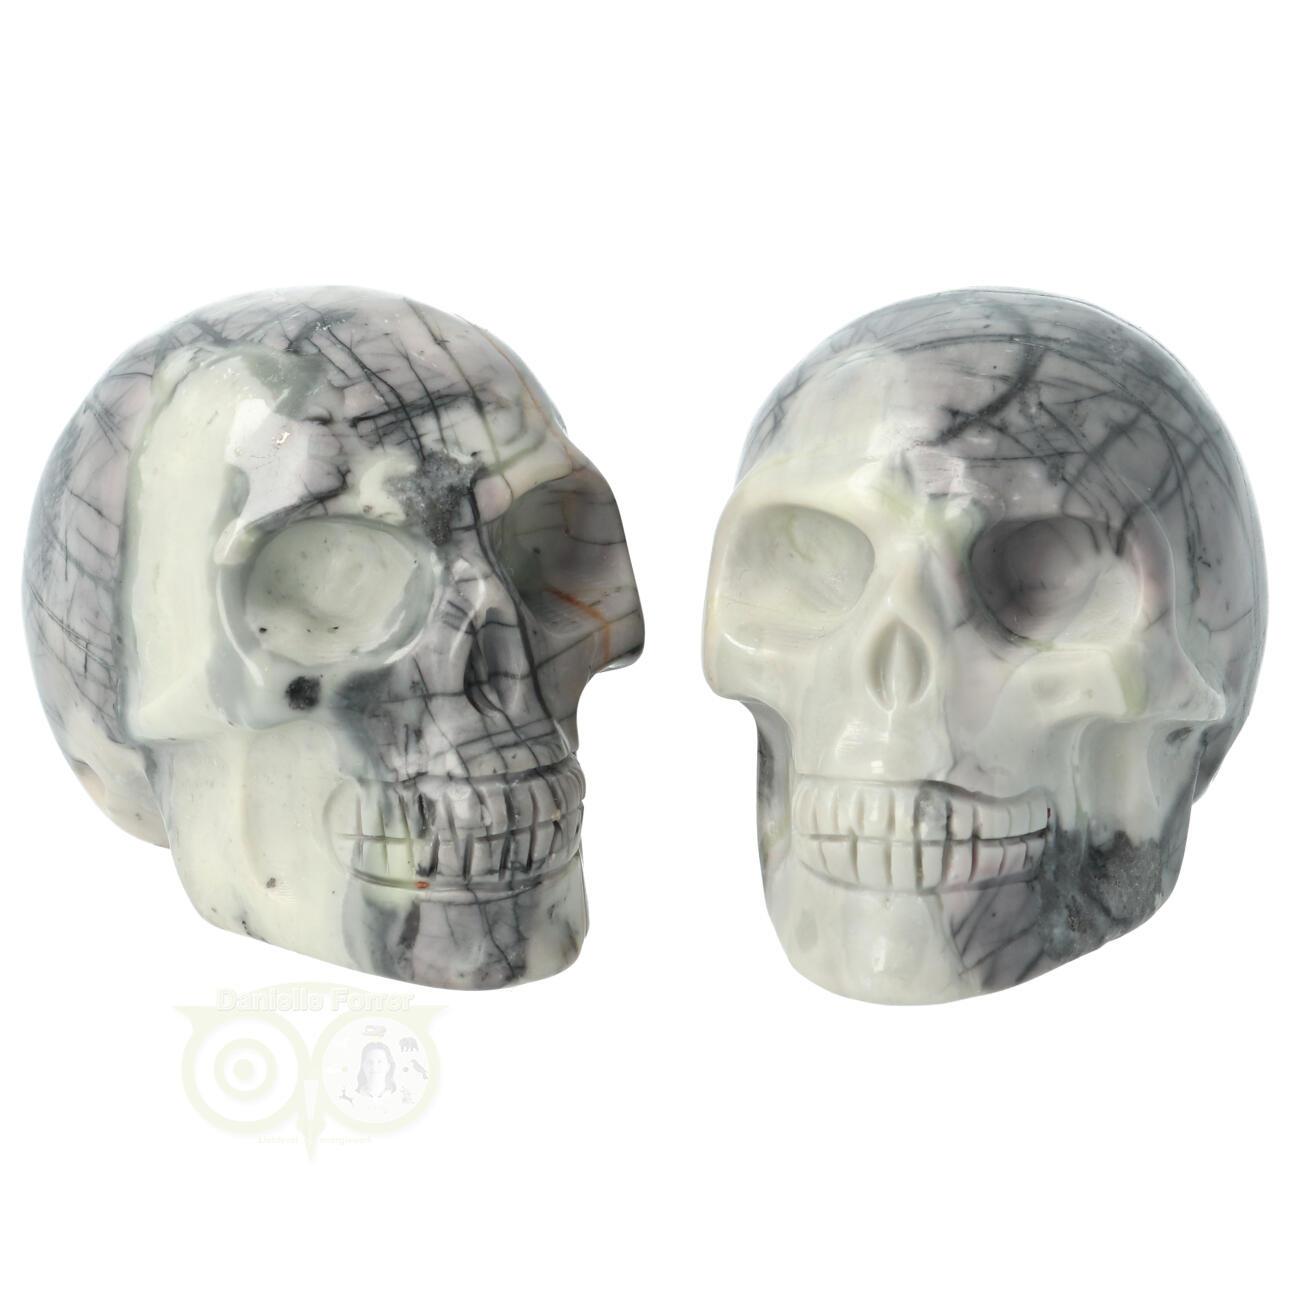 Picasso Jaspis schedel kopen - Picasso Jaspis schedeltje kopen - Edelstenen Webwinkel - Webshop Danielle Forrer